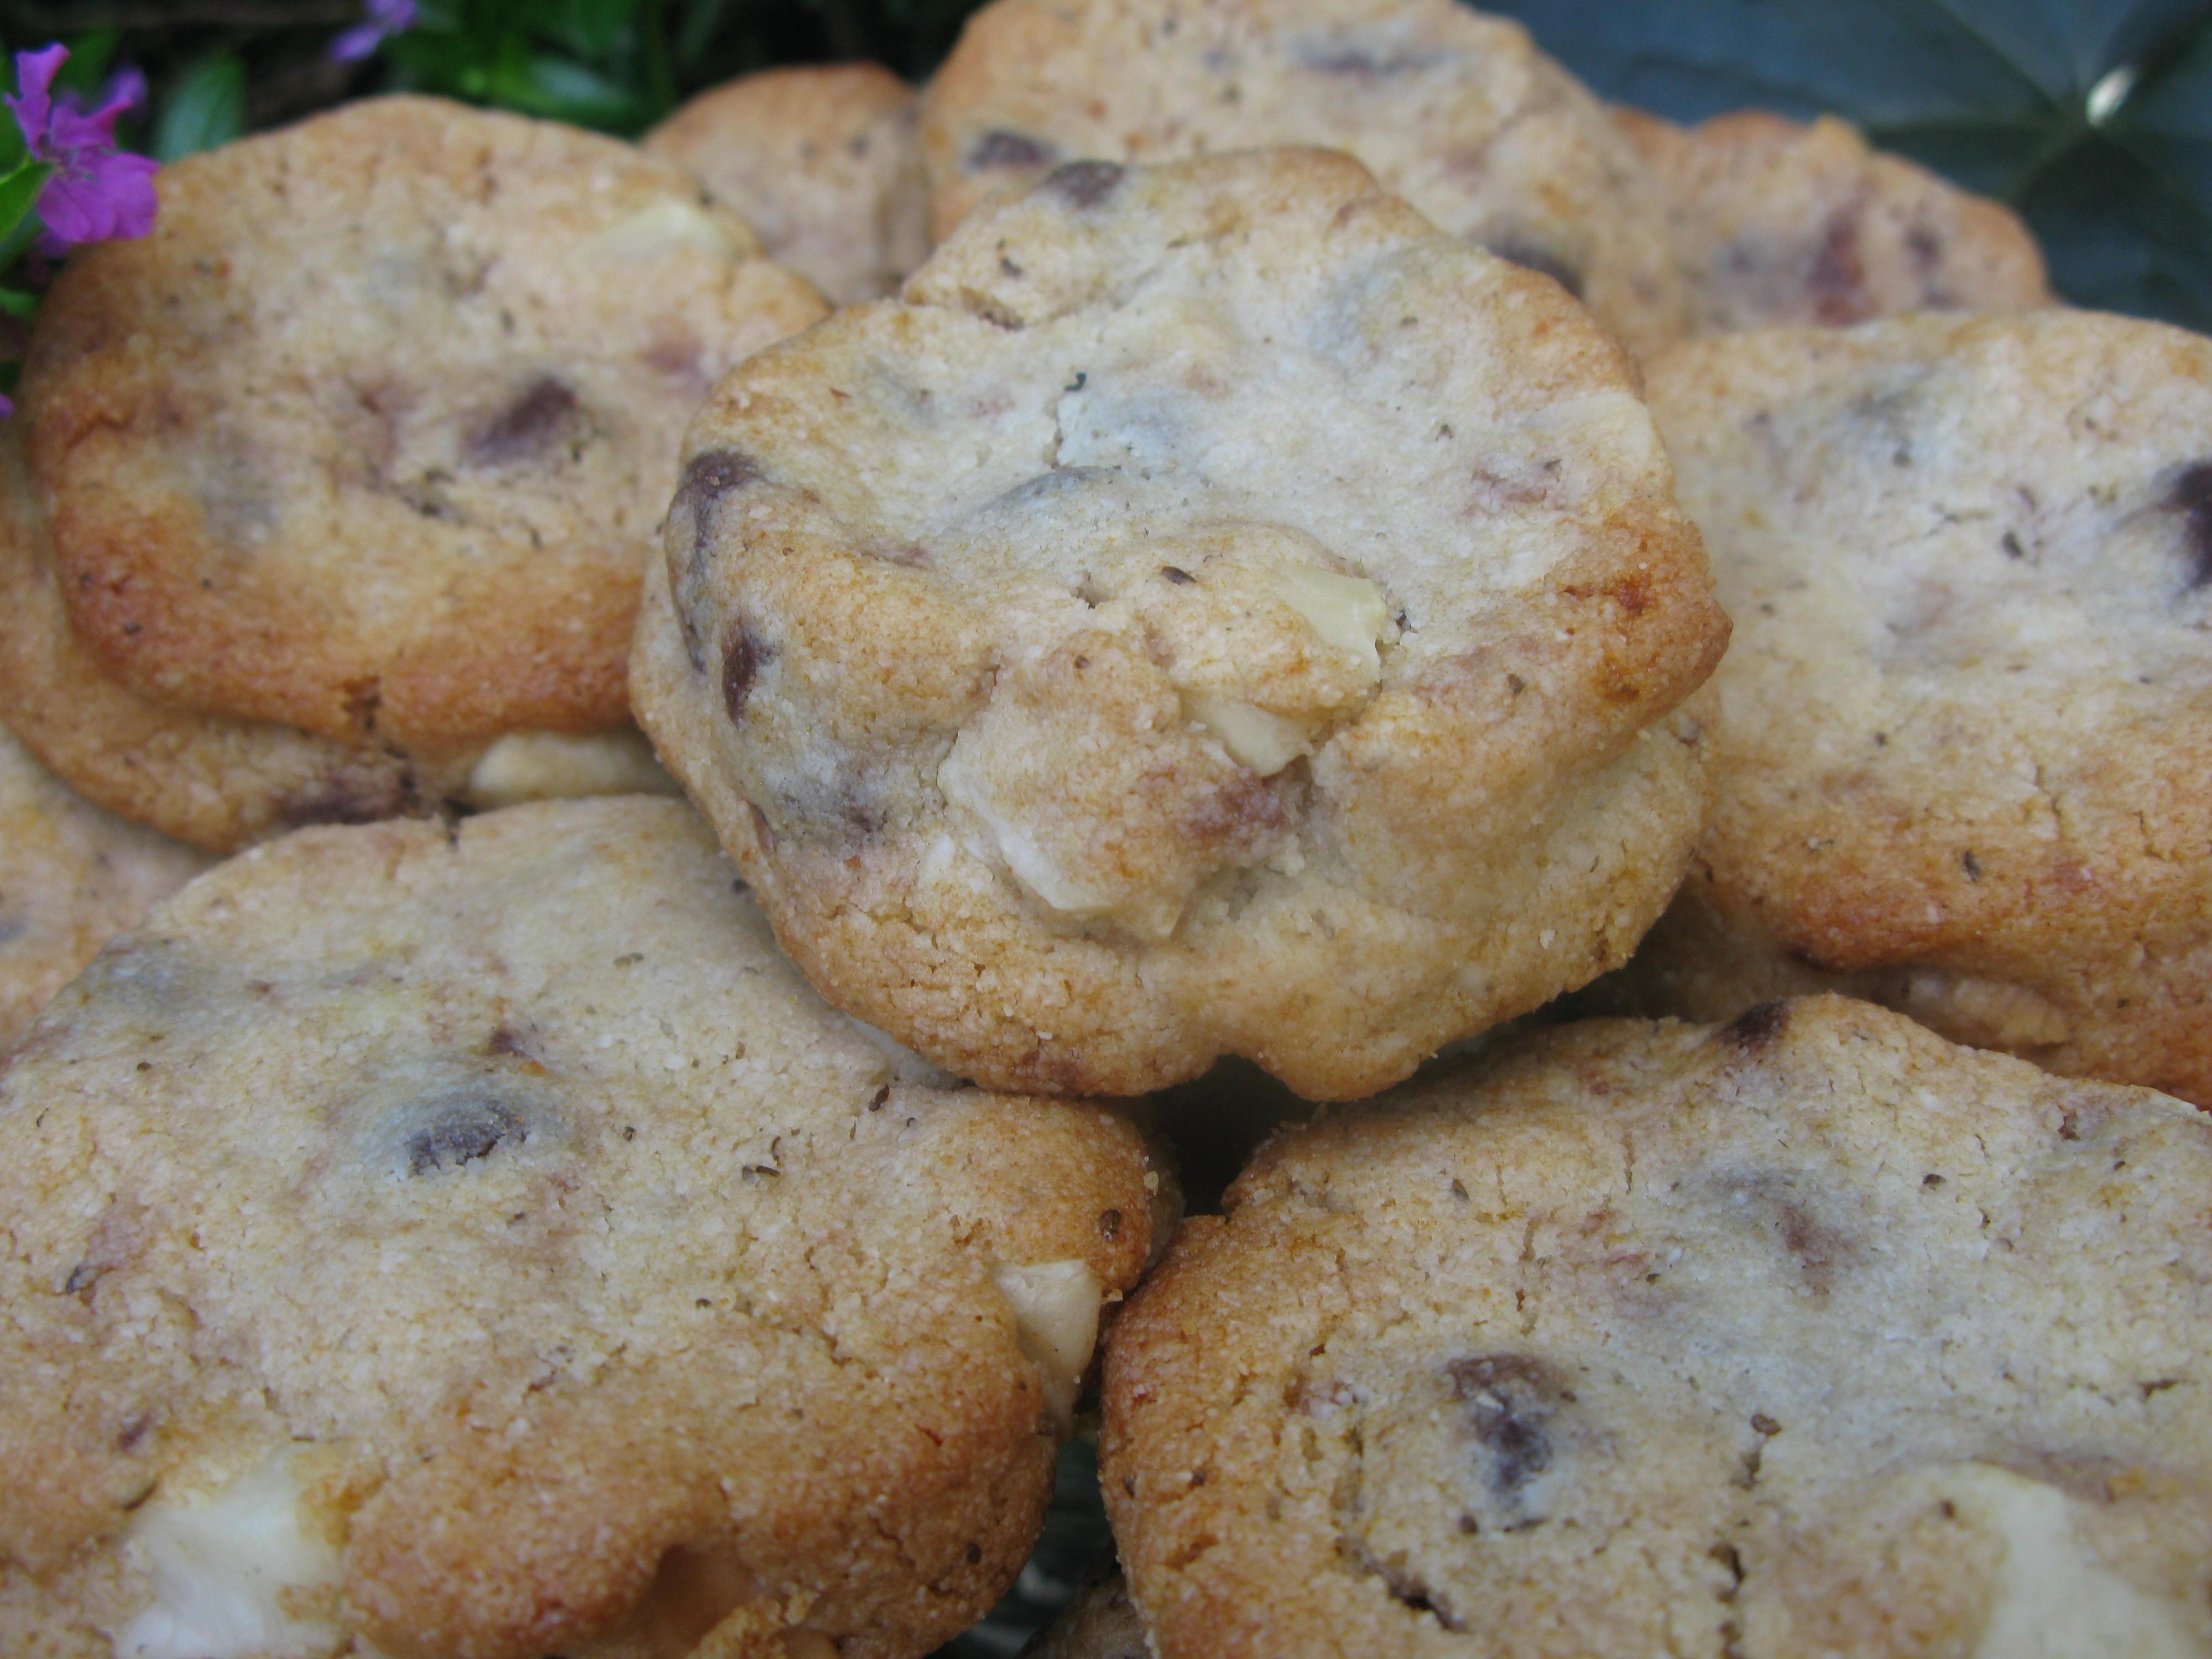 Tina's Amazing Chocolate Chip Cookies